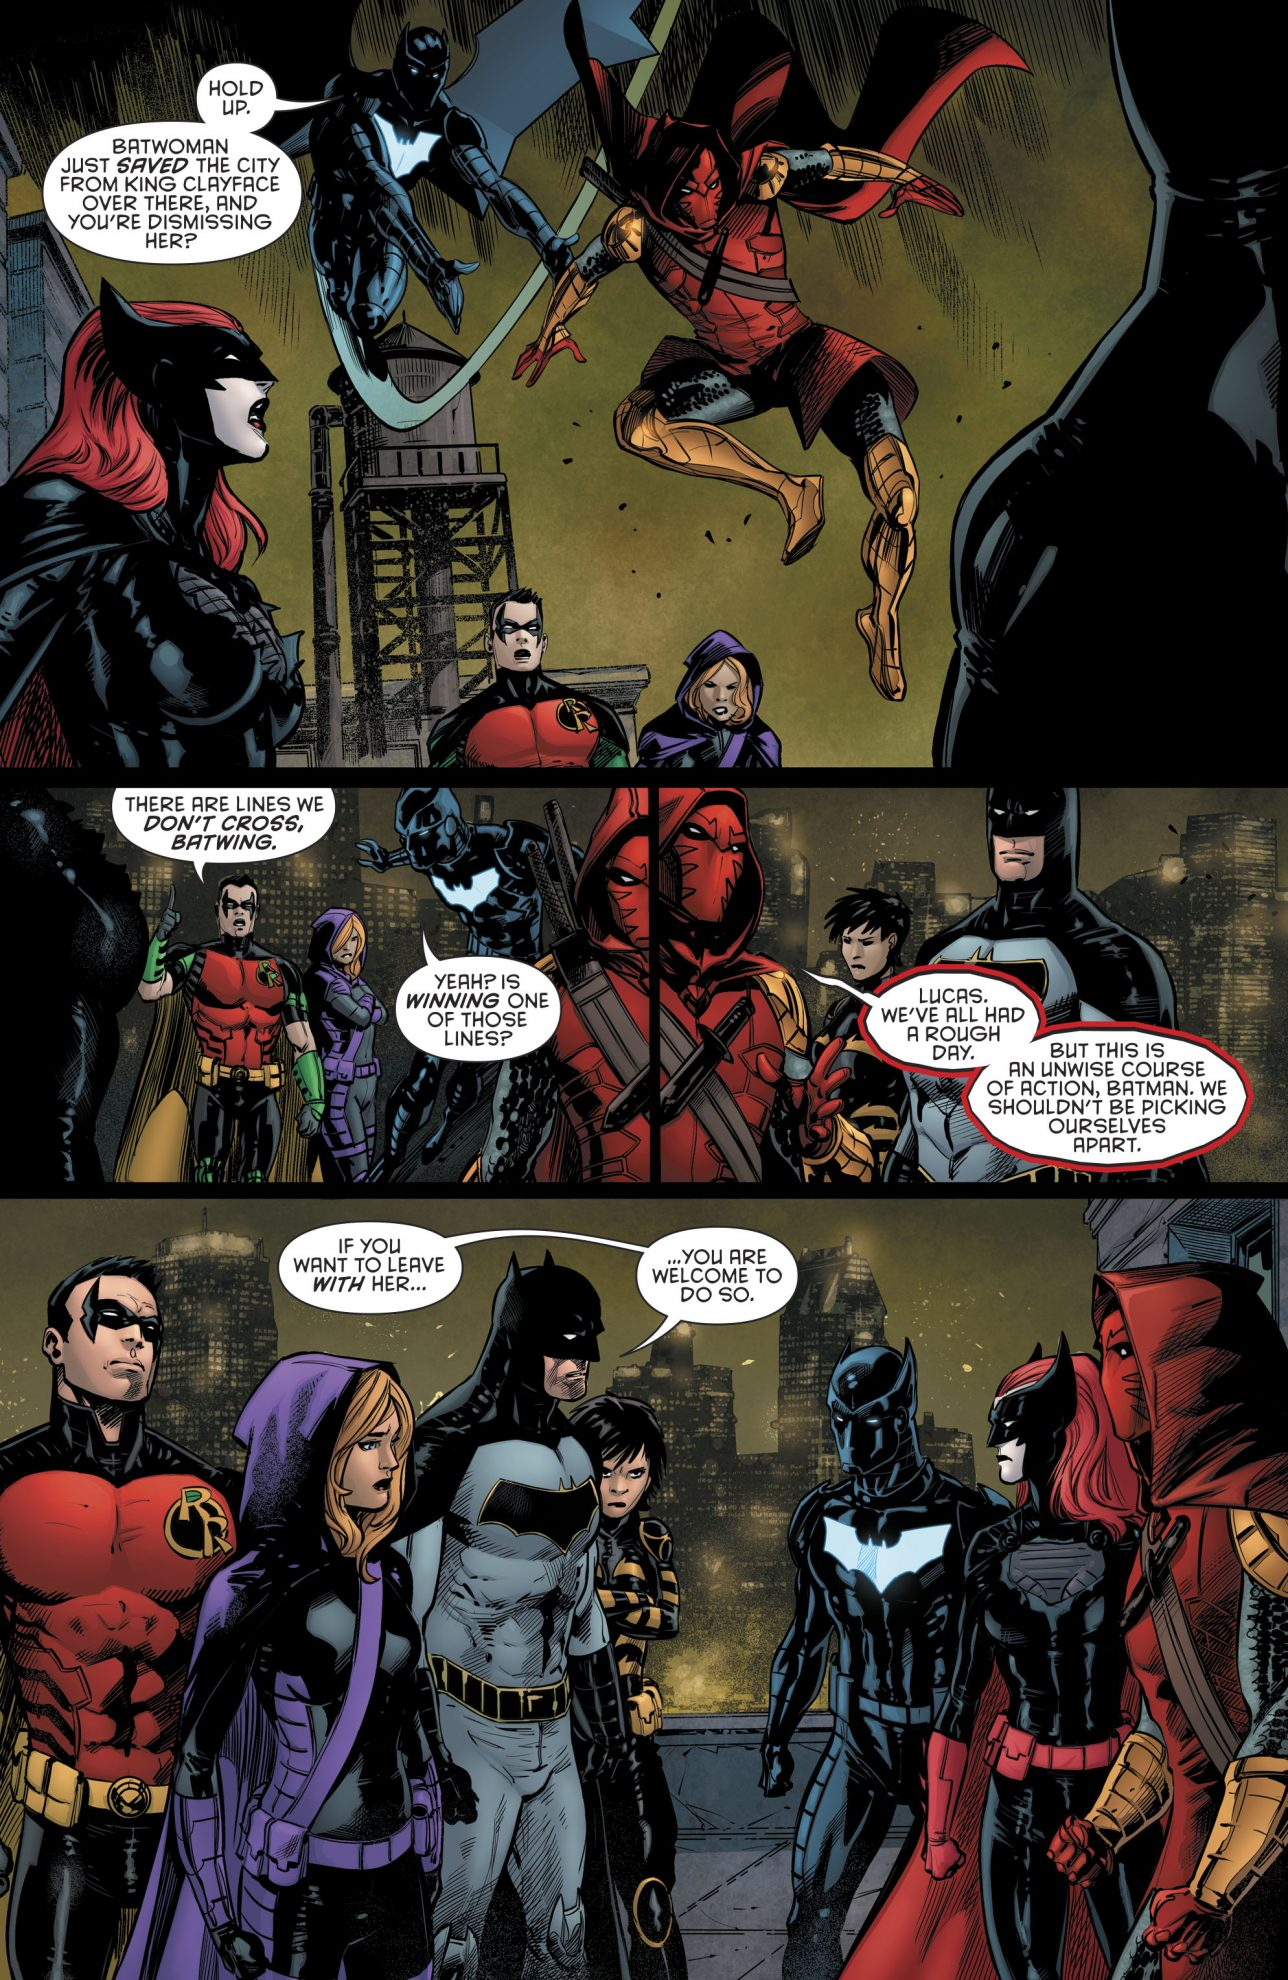 Batman Removes Batwoman From His Team (Rebirth)